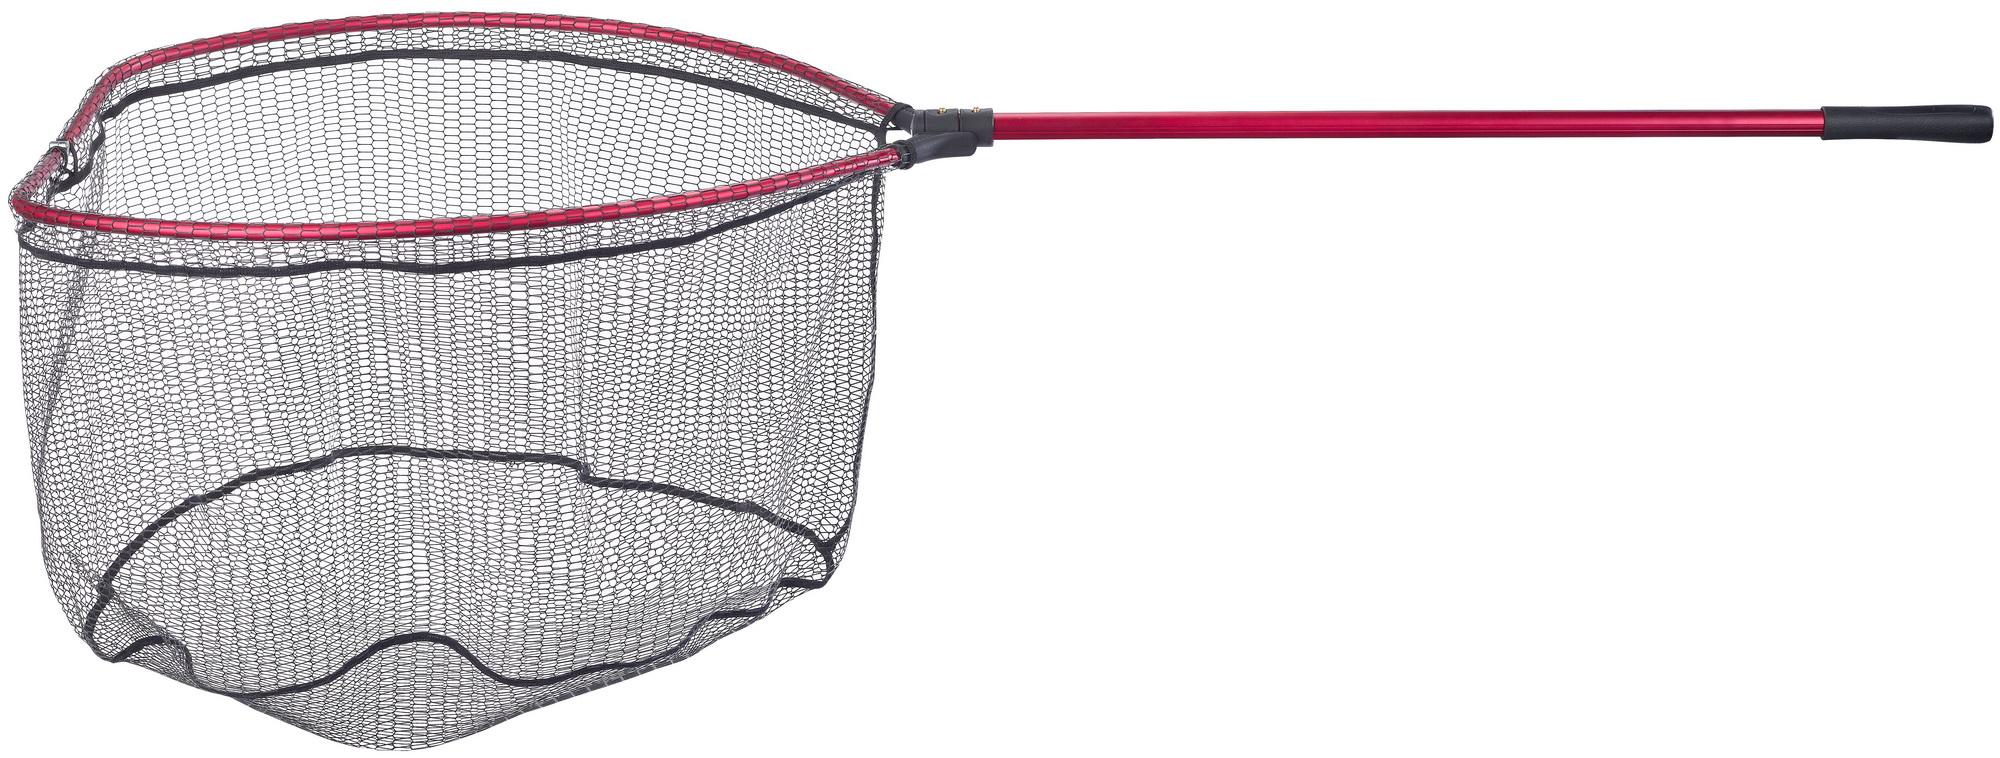 Подсака Balzer Shirasu длина 1.85м  голова 0.83м